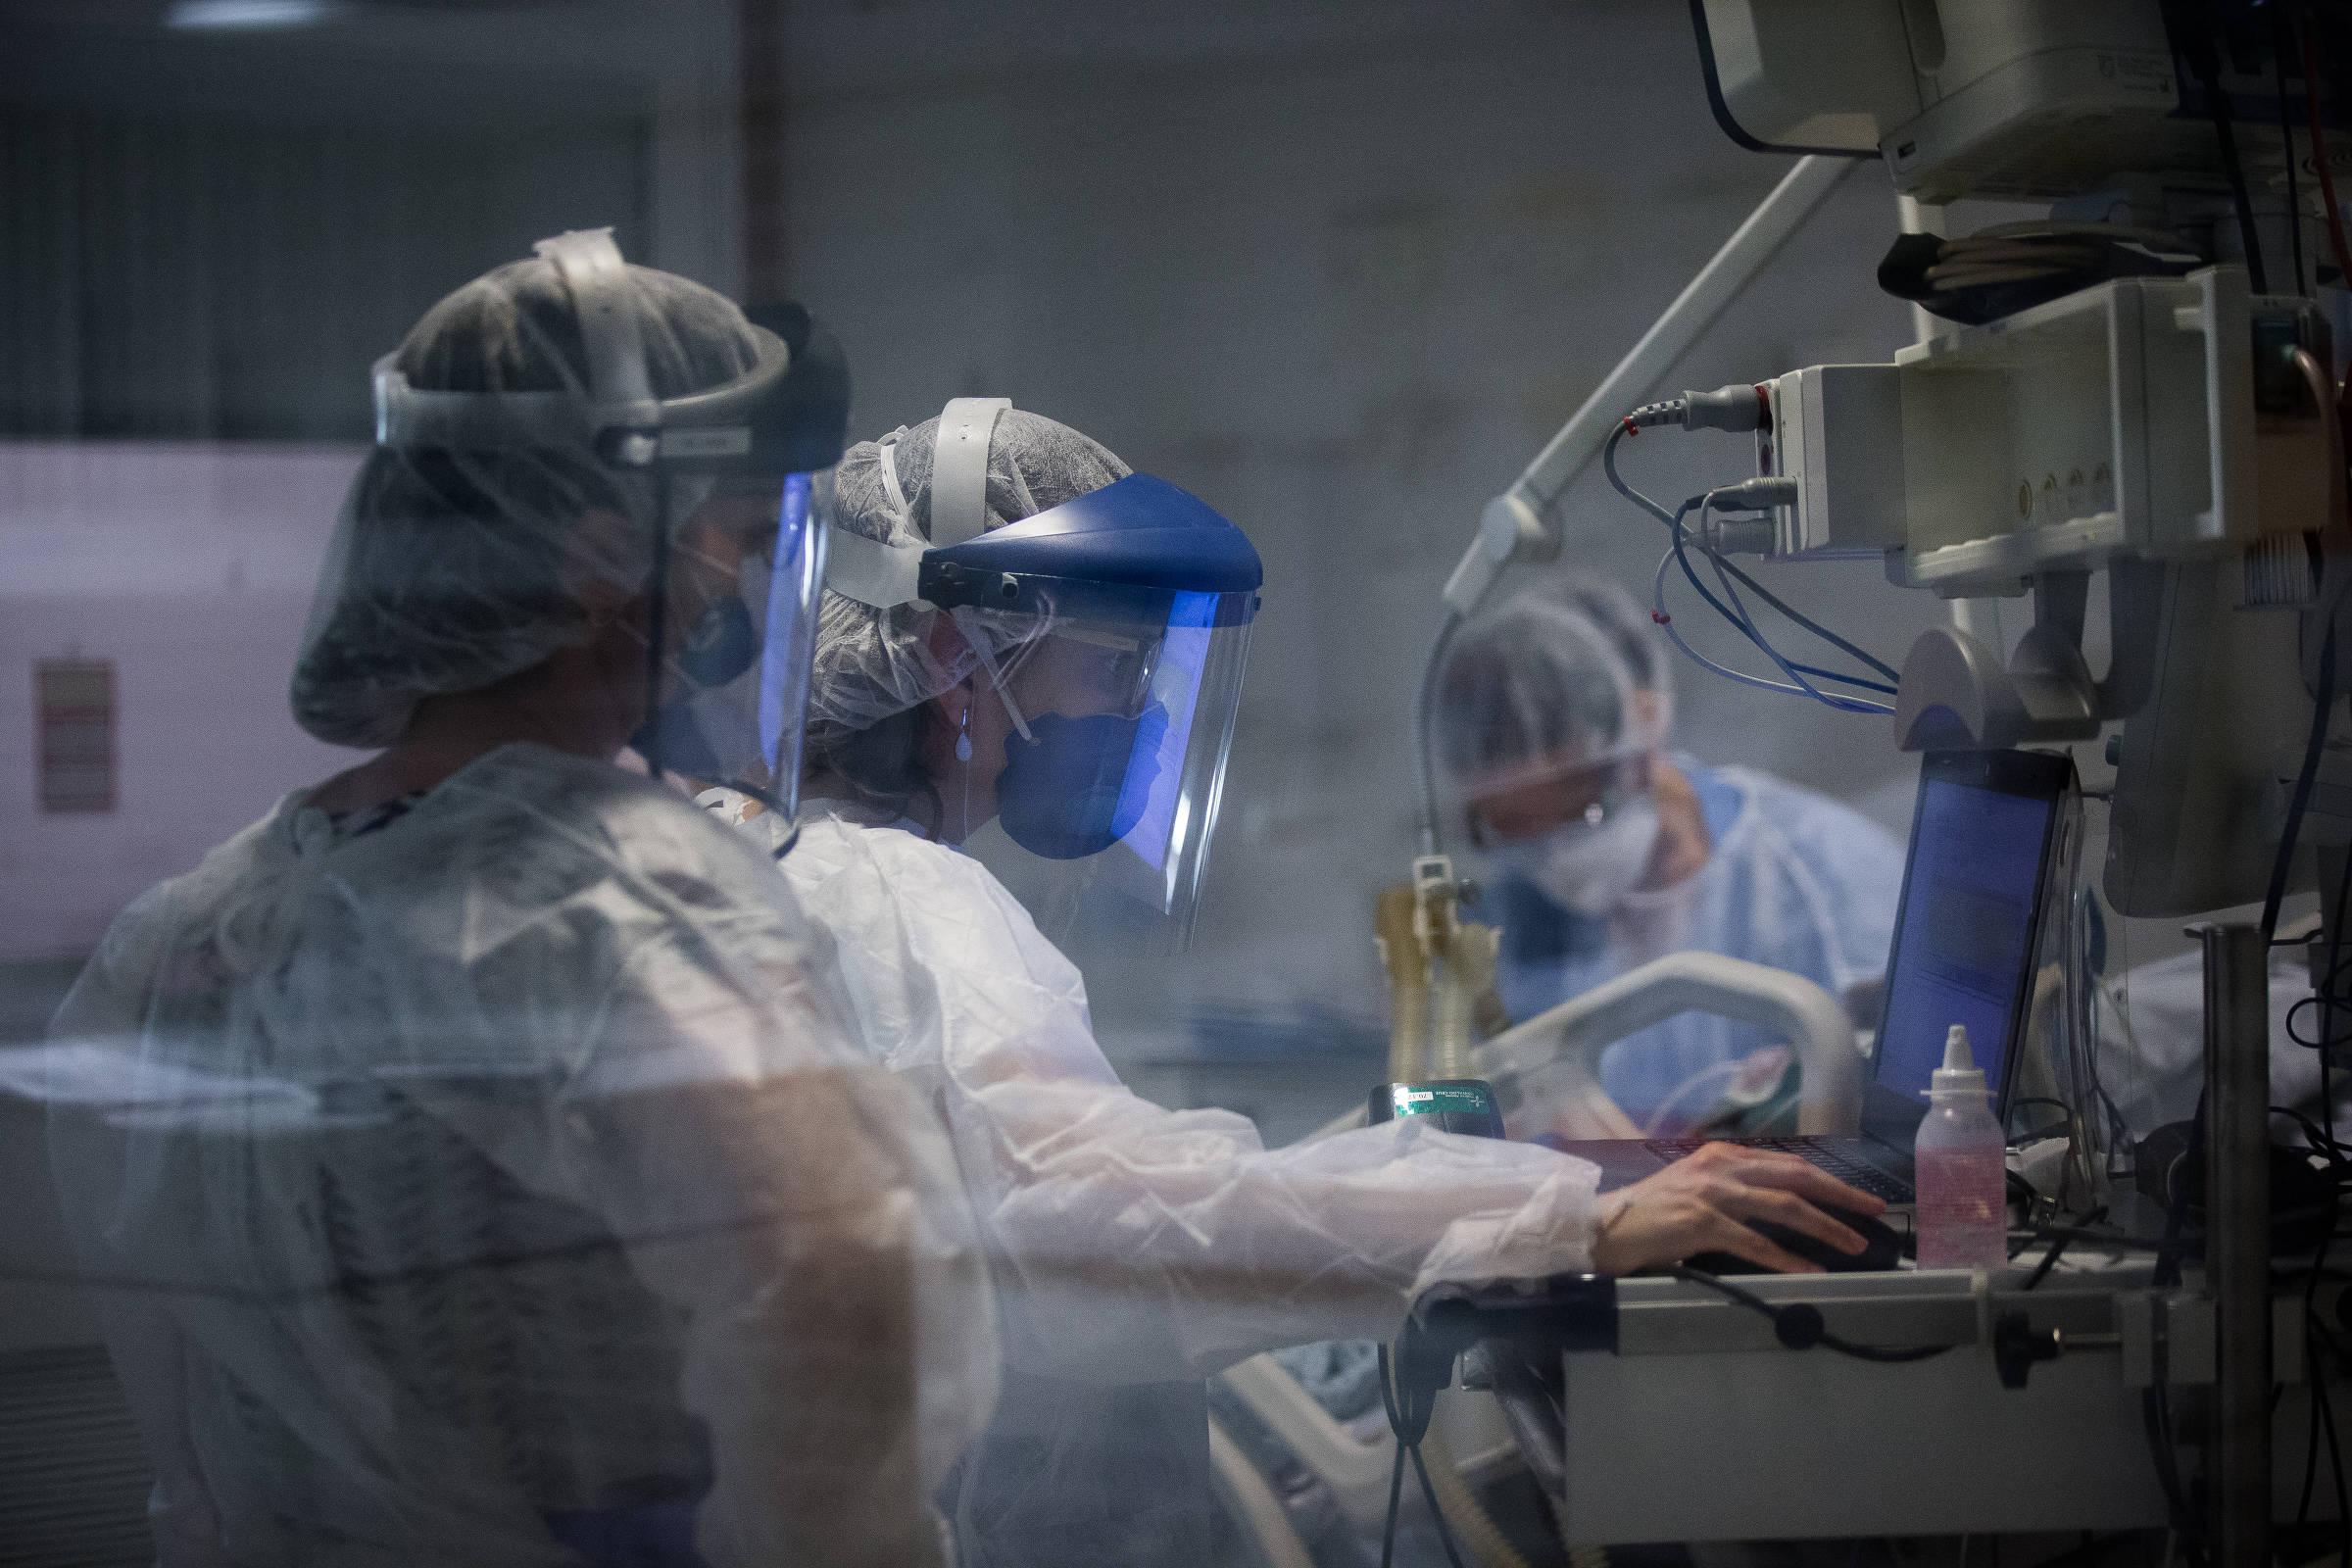 Desigualdade na morte durante a pandemia